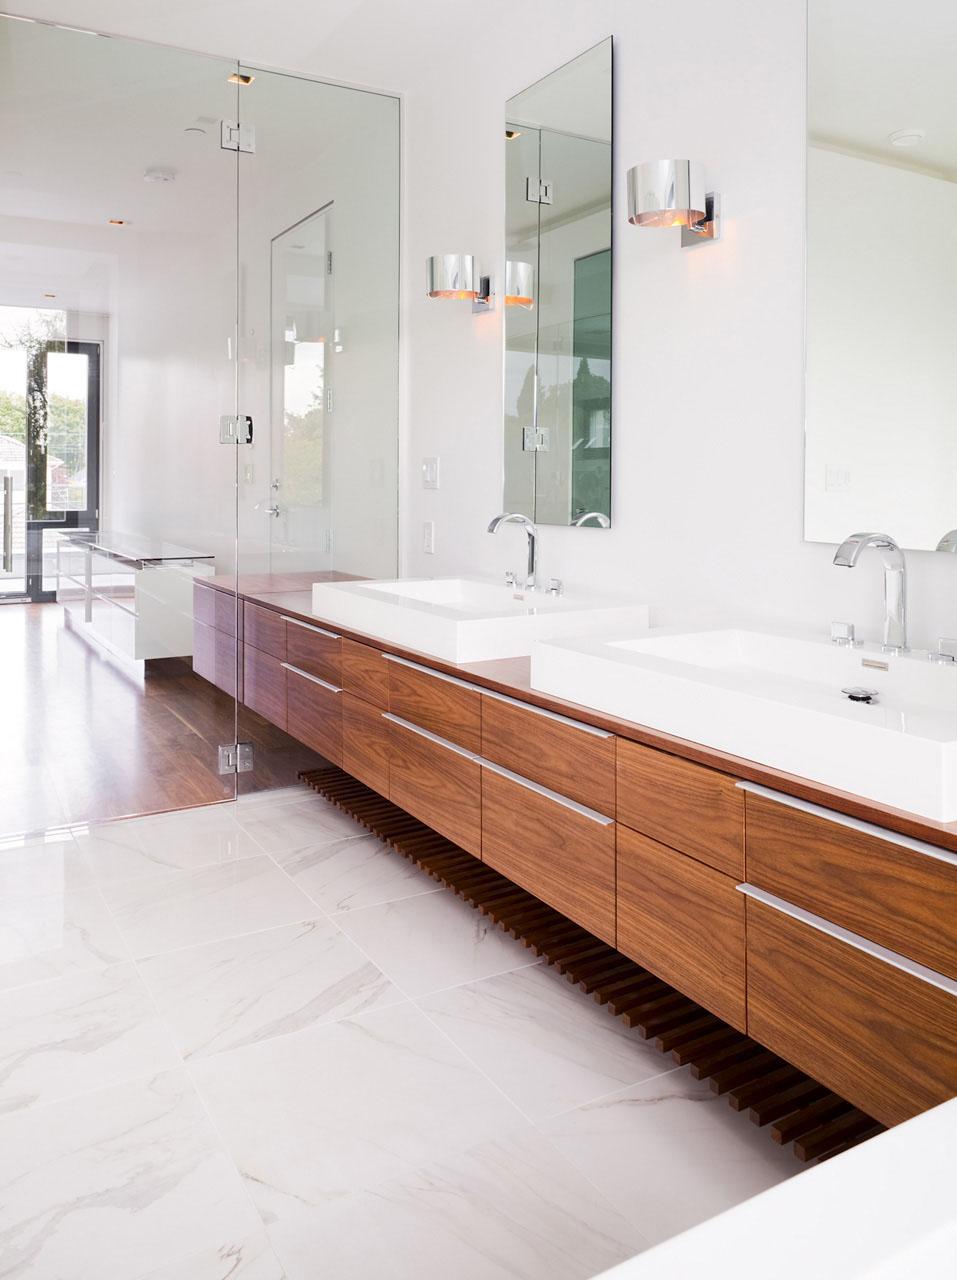 Sustainable Home Design In Vancouver | iDesignArch | Interior Design ...